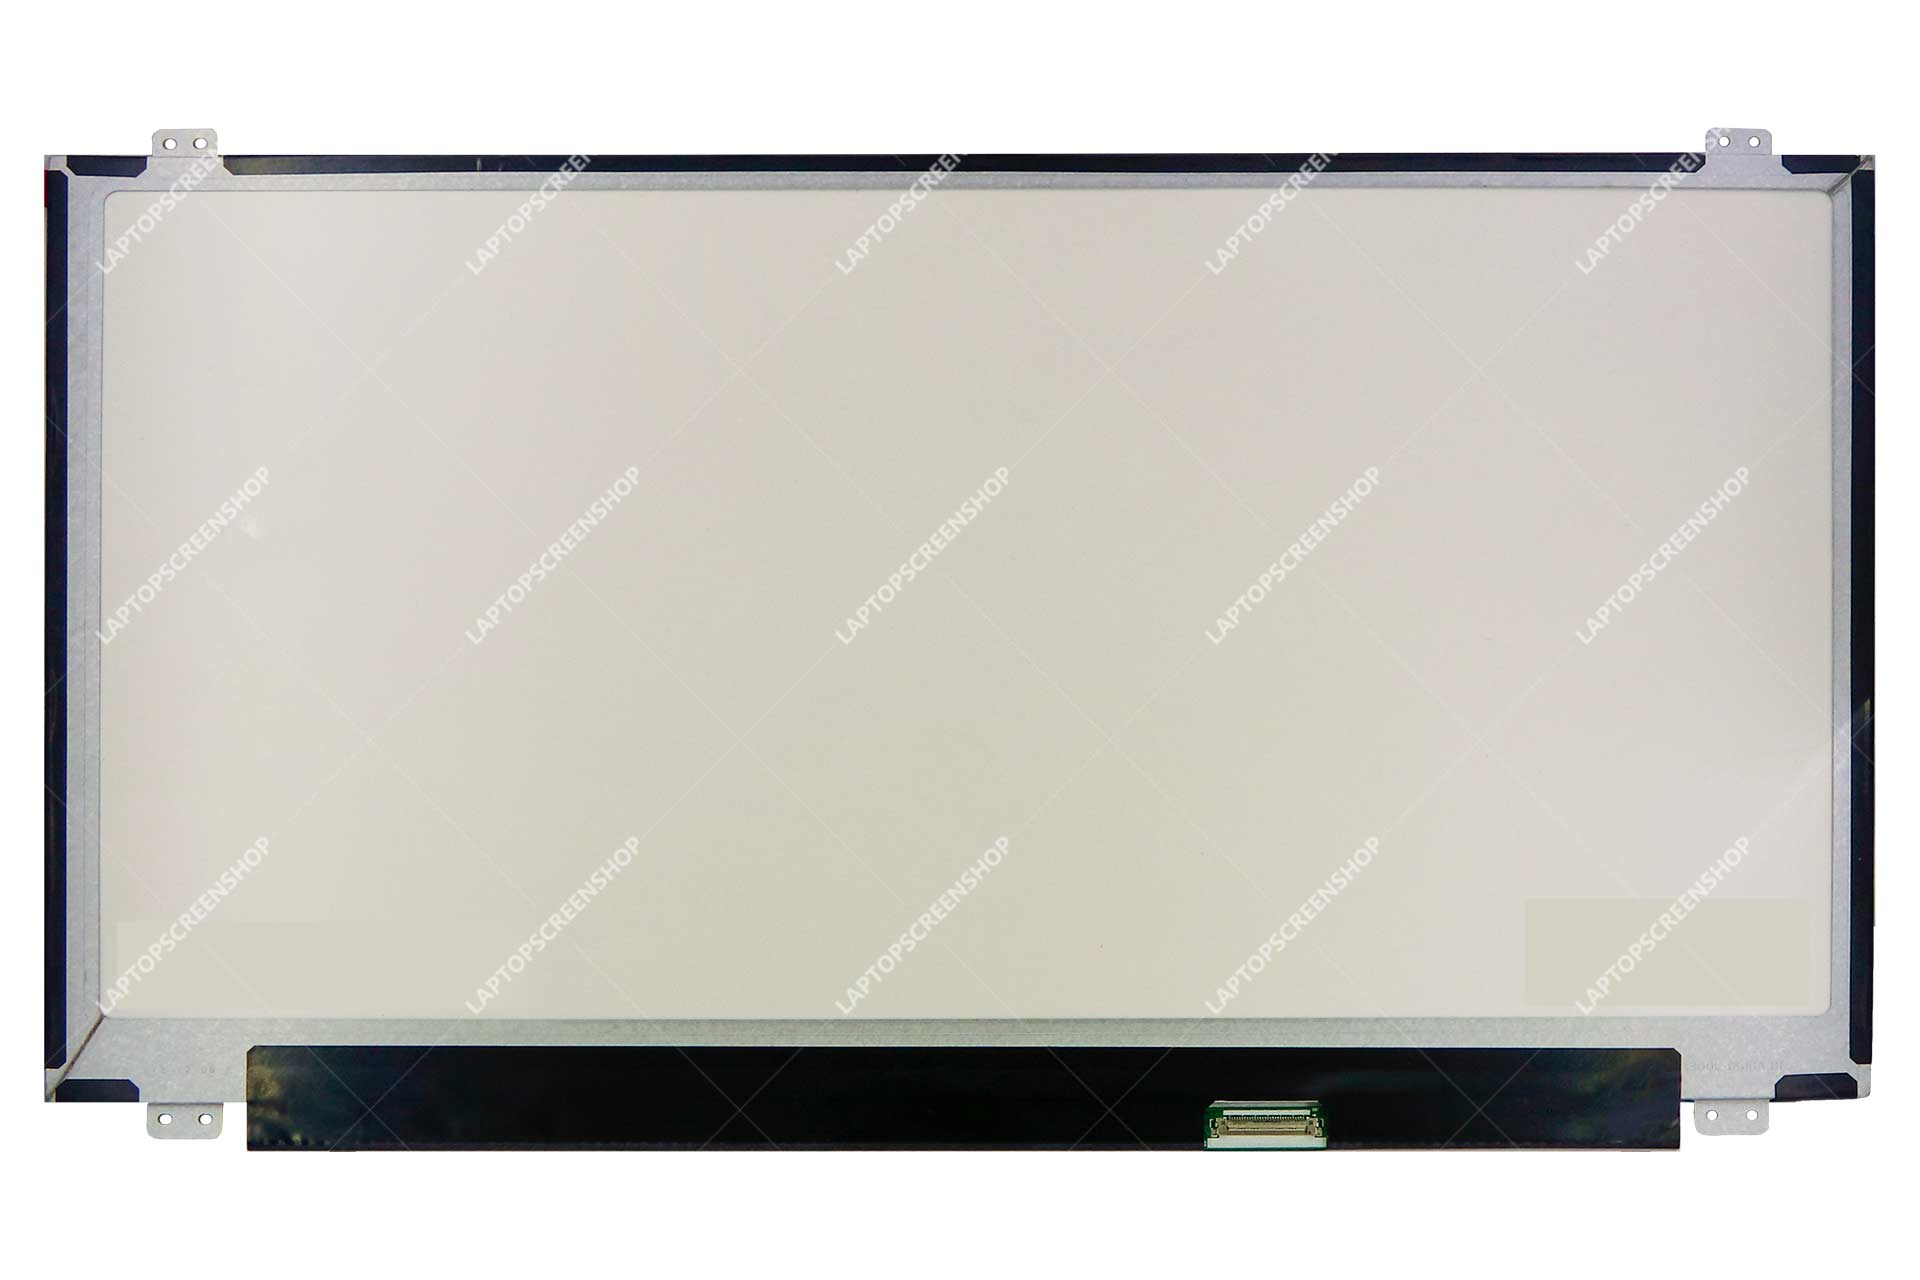 ACER-ASPIRE-E1-532-2616-LCD |HD|فروشگاه لپ تاپ اسکرين | تعمير لپ تاپ